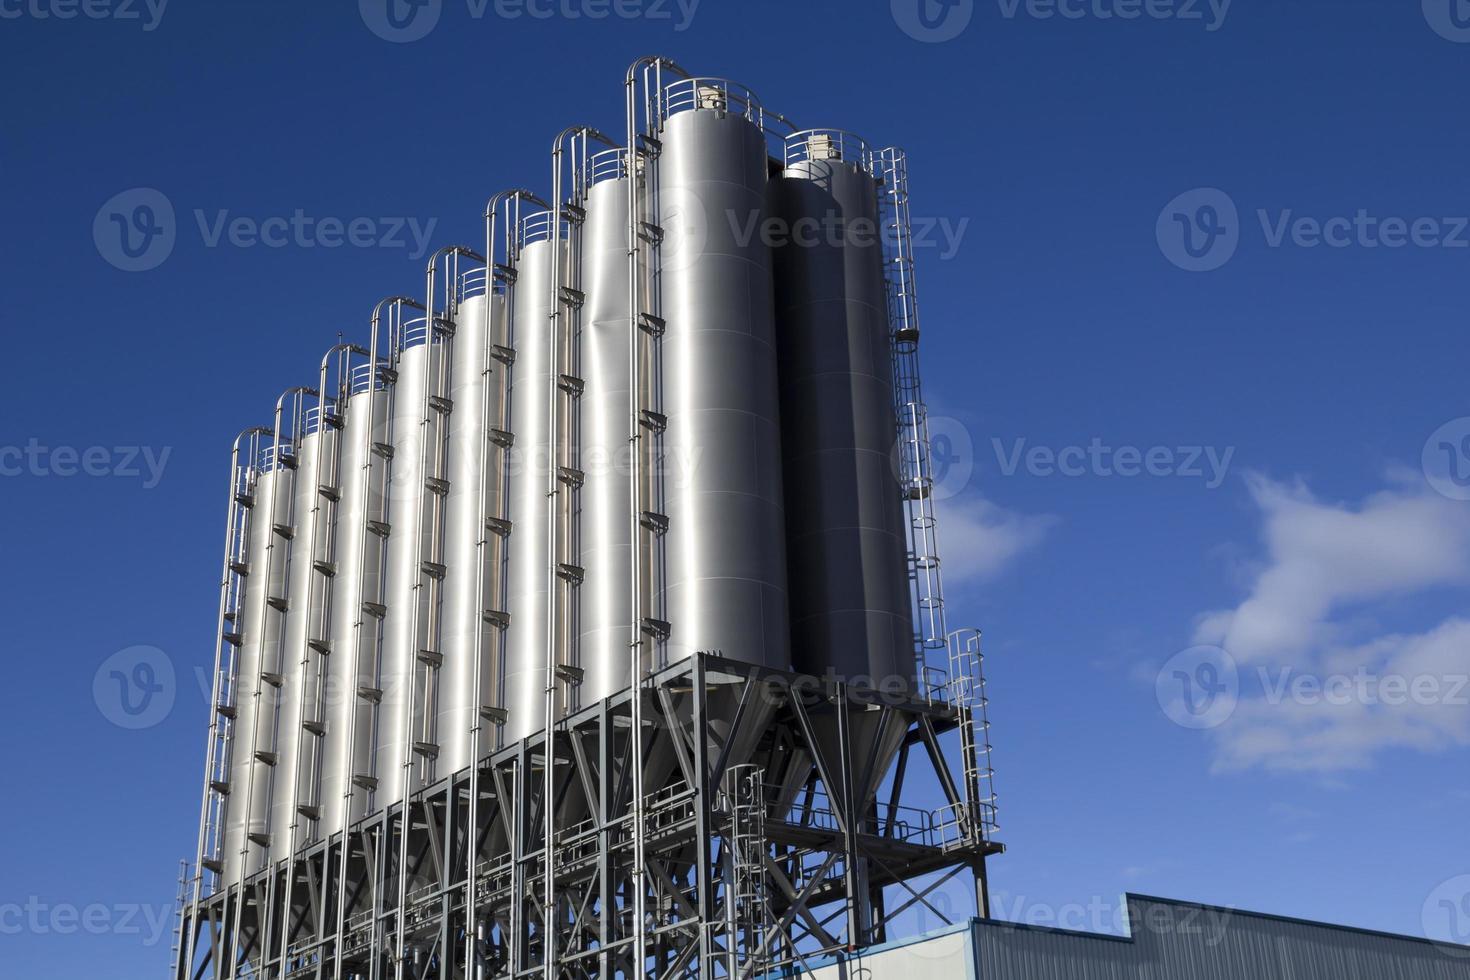 industriële silo's foto